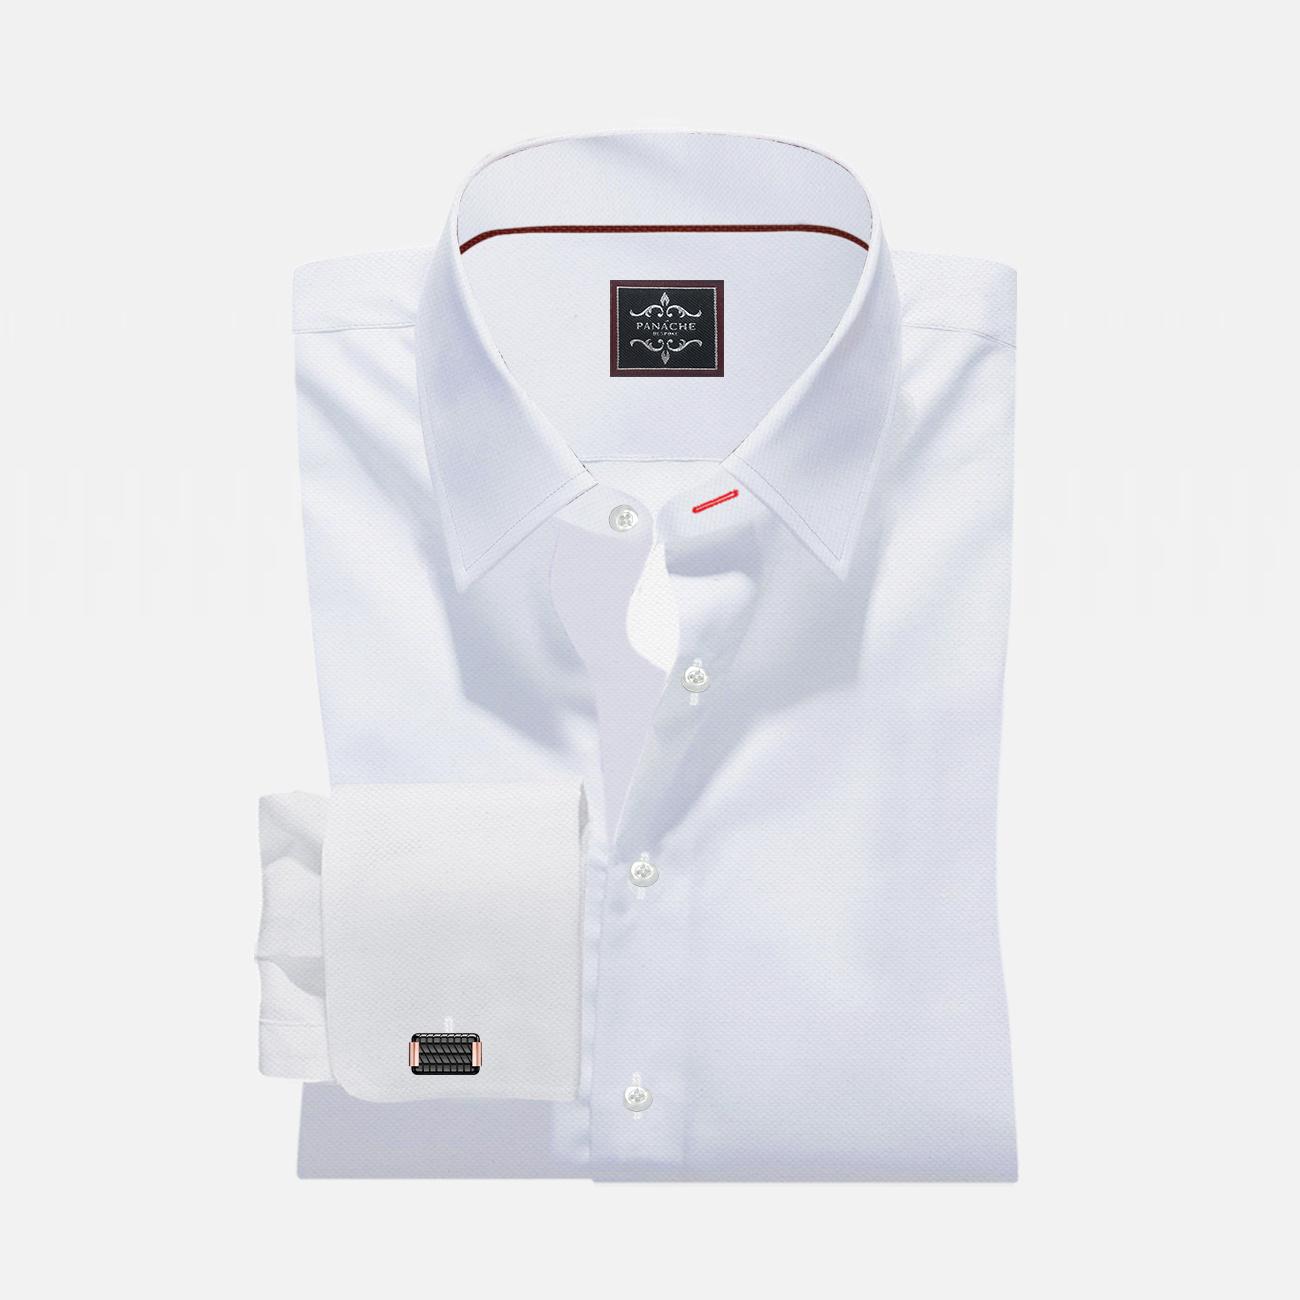 Luxury White Custom Made Royal Oxford Shirt